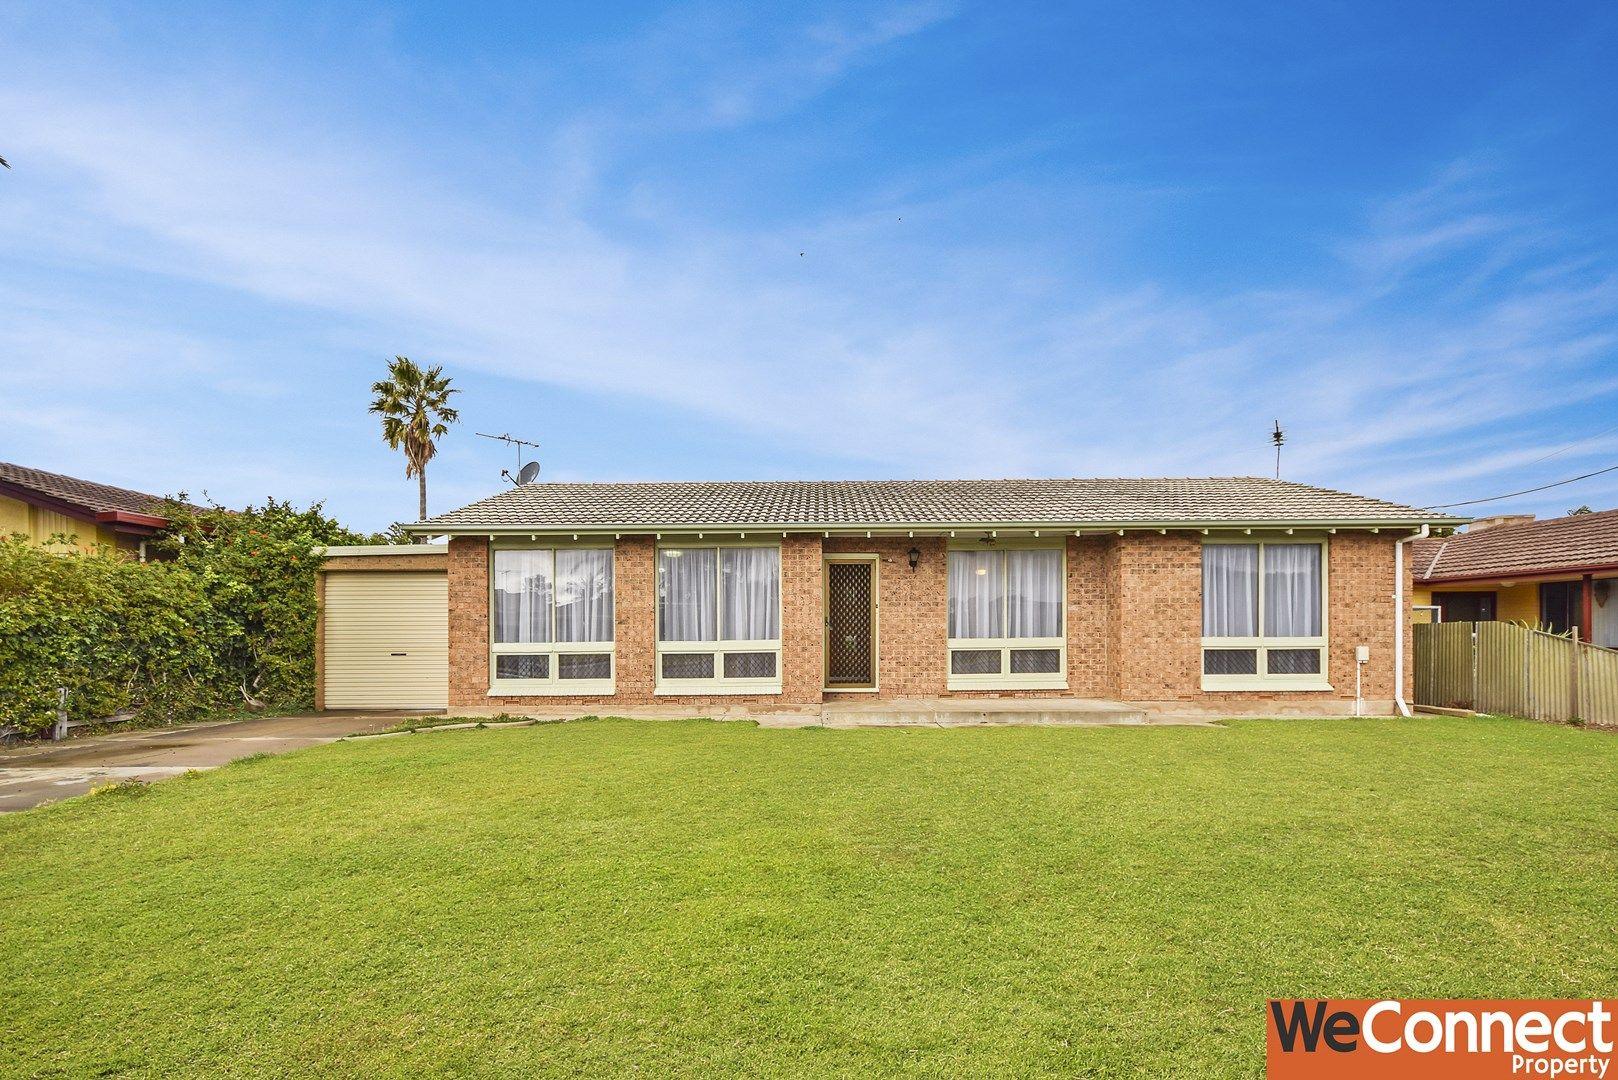 44 Helmsman Terrace, Seaford SA 5169, Image 0